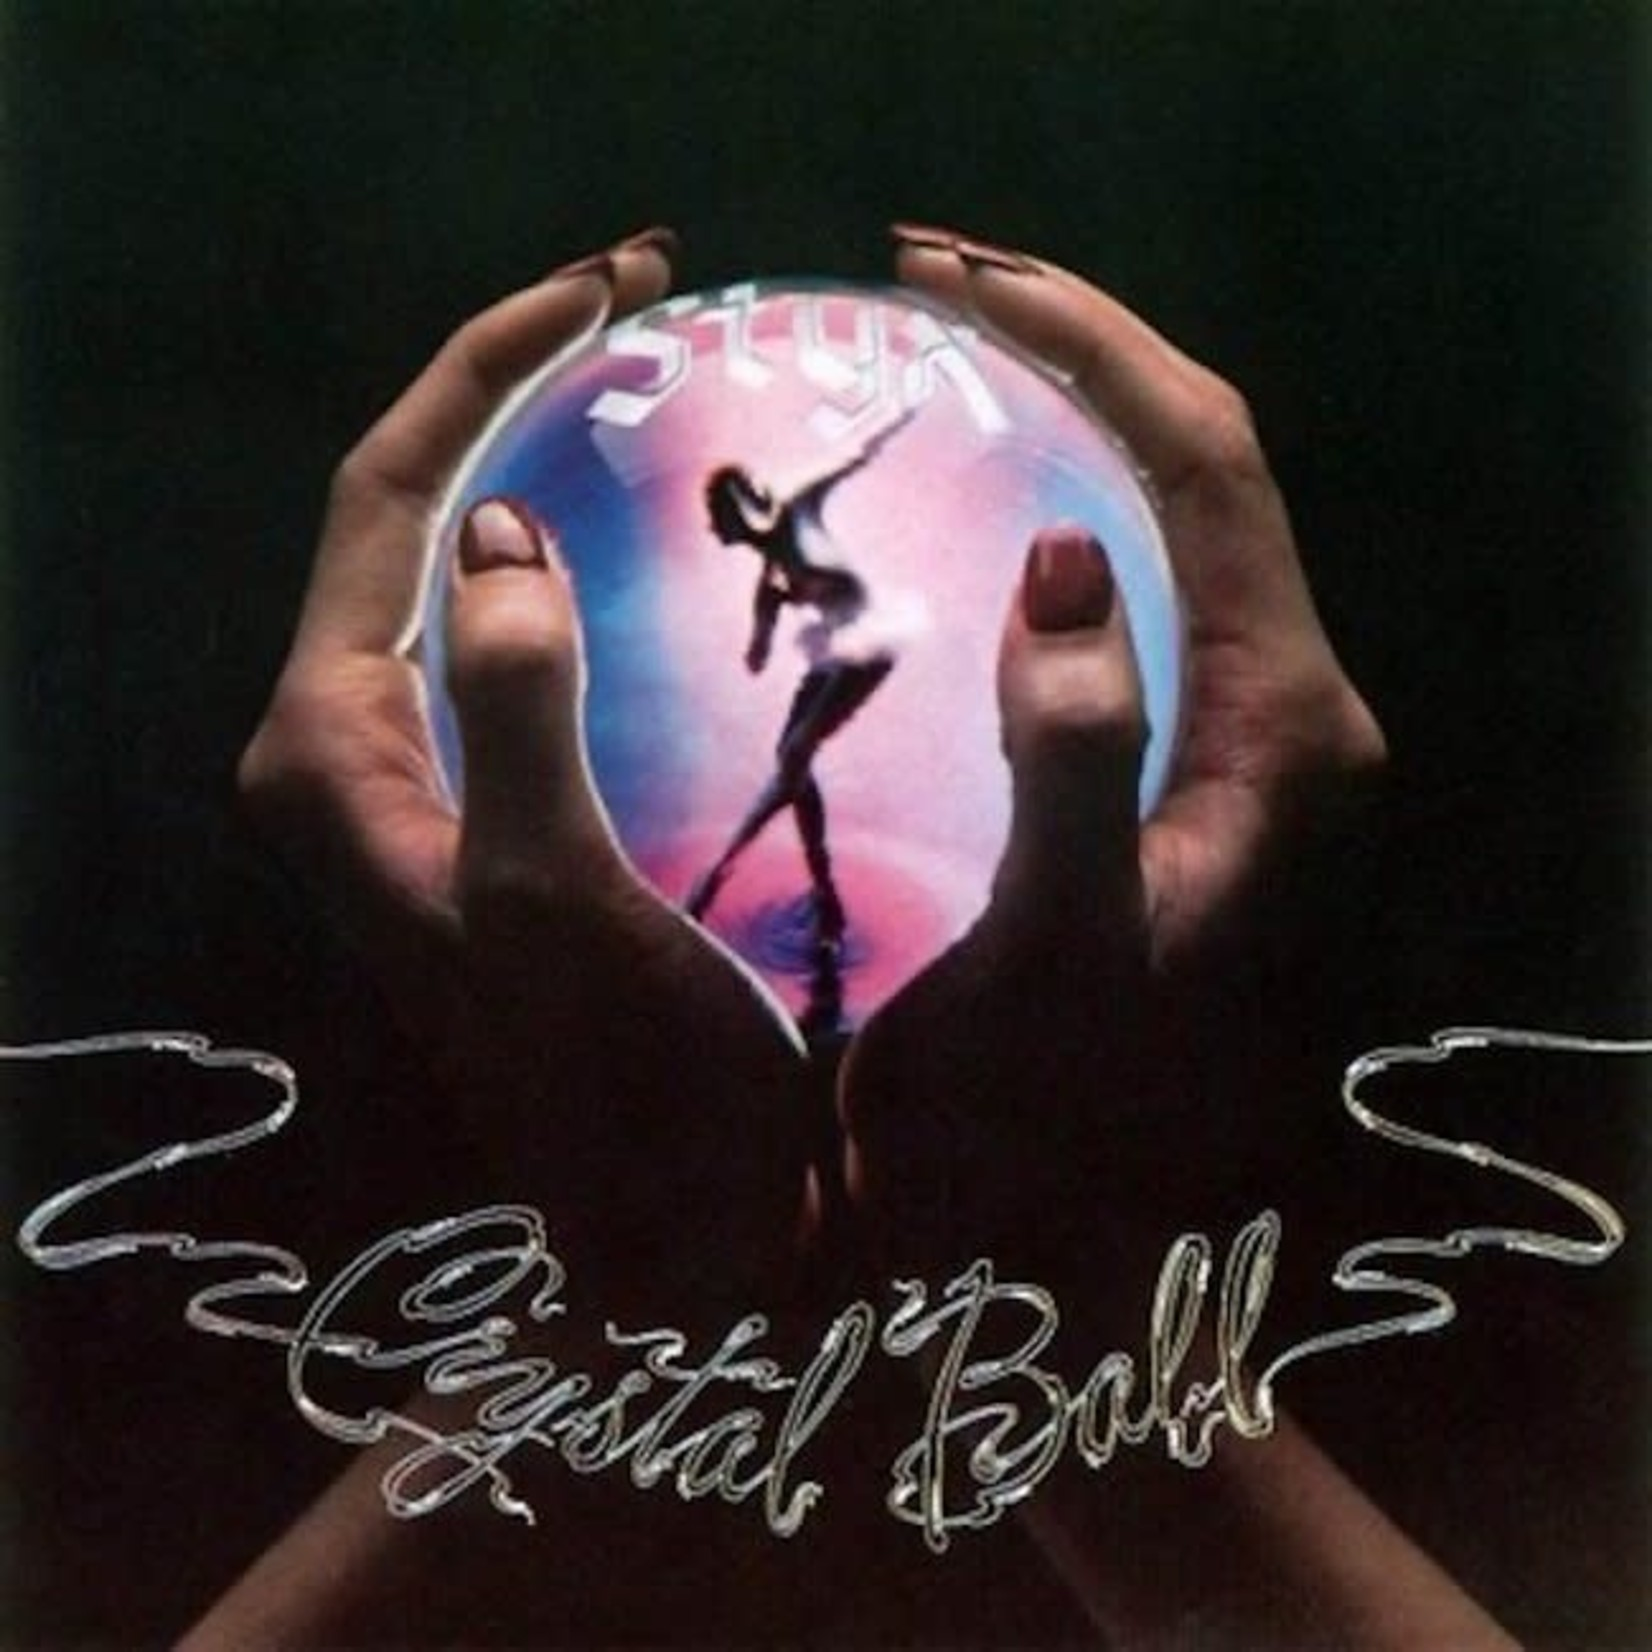 [Vintage] Styx: Crystal Ball